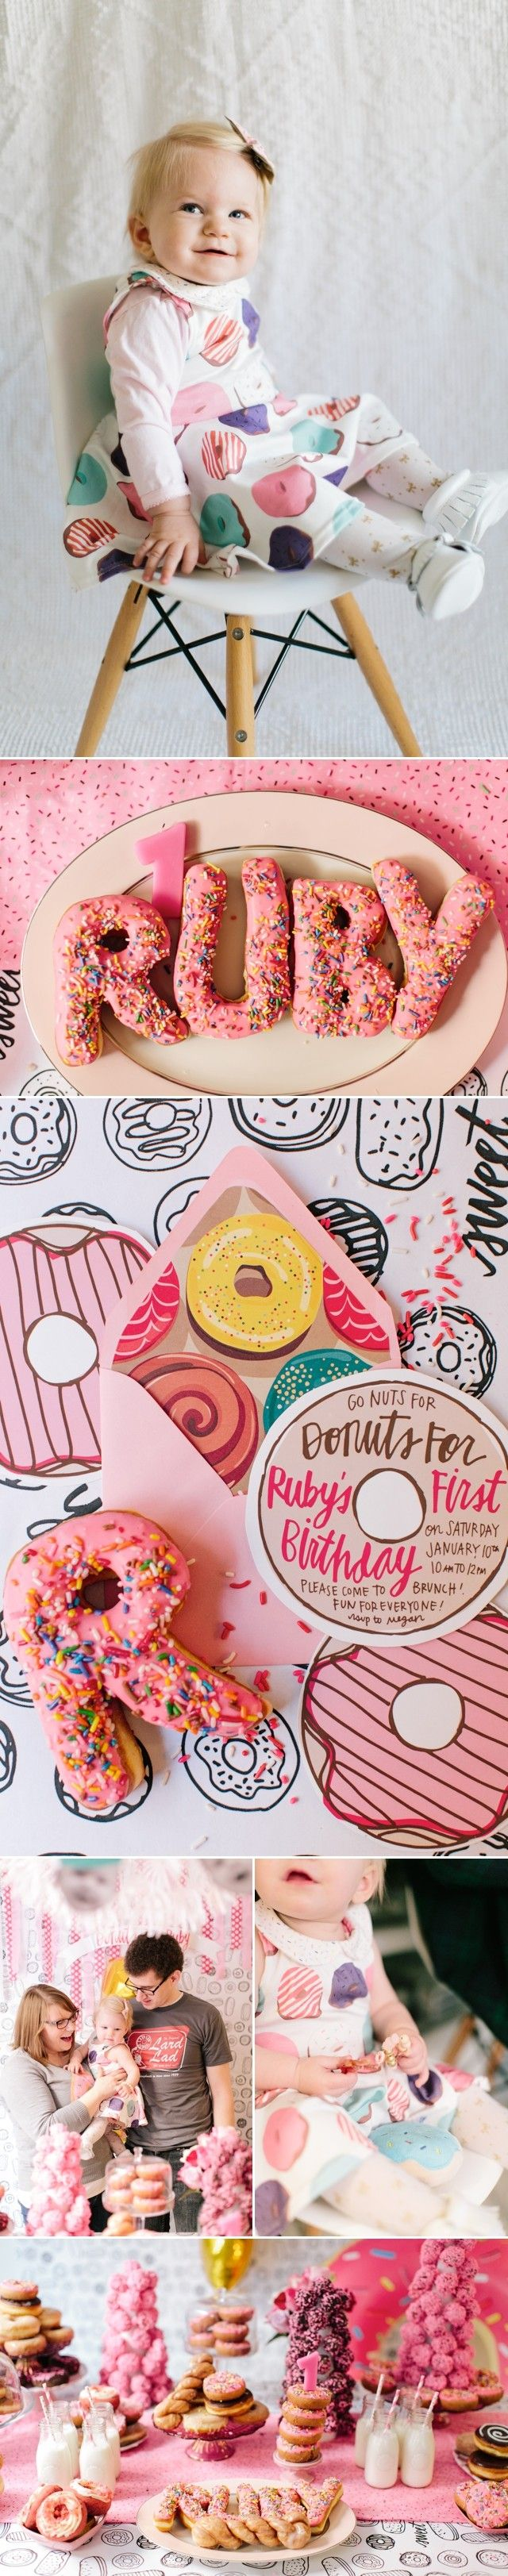 First Birthday Donut Party by Meg Ruth Photo #nationaldonutday